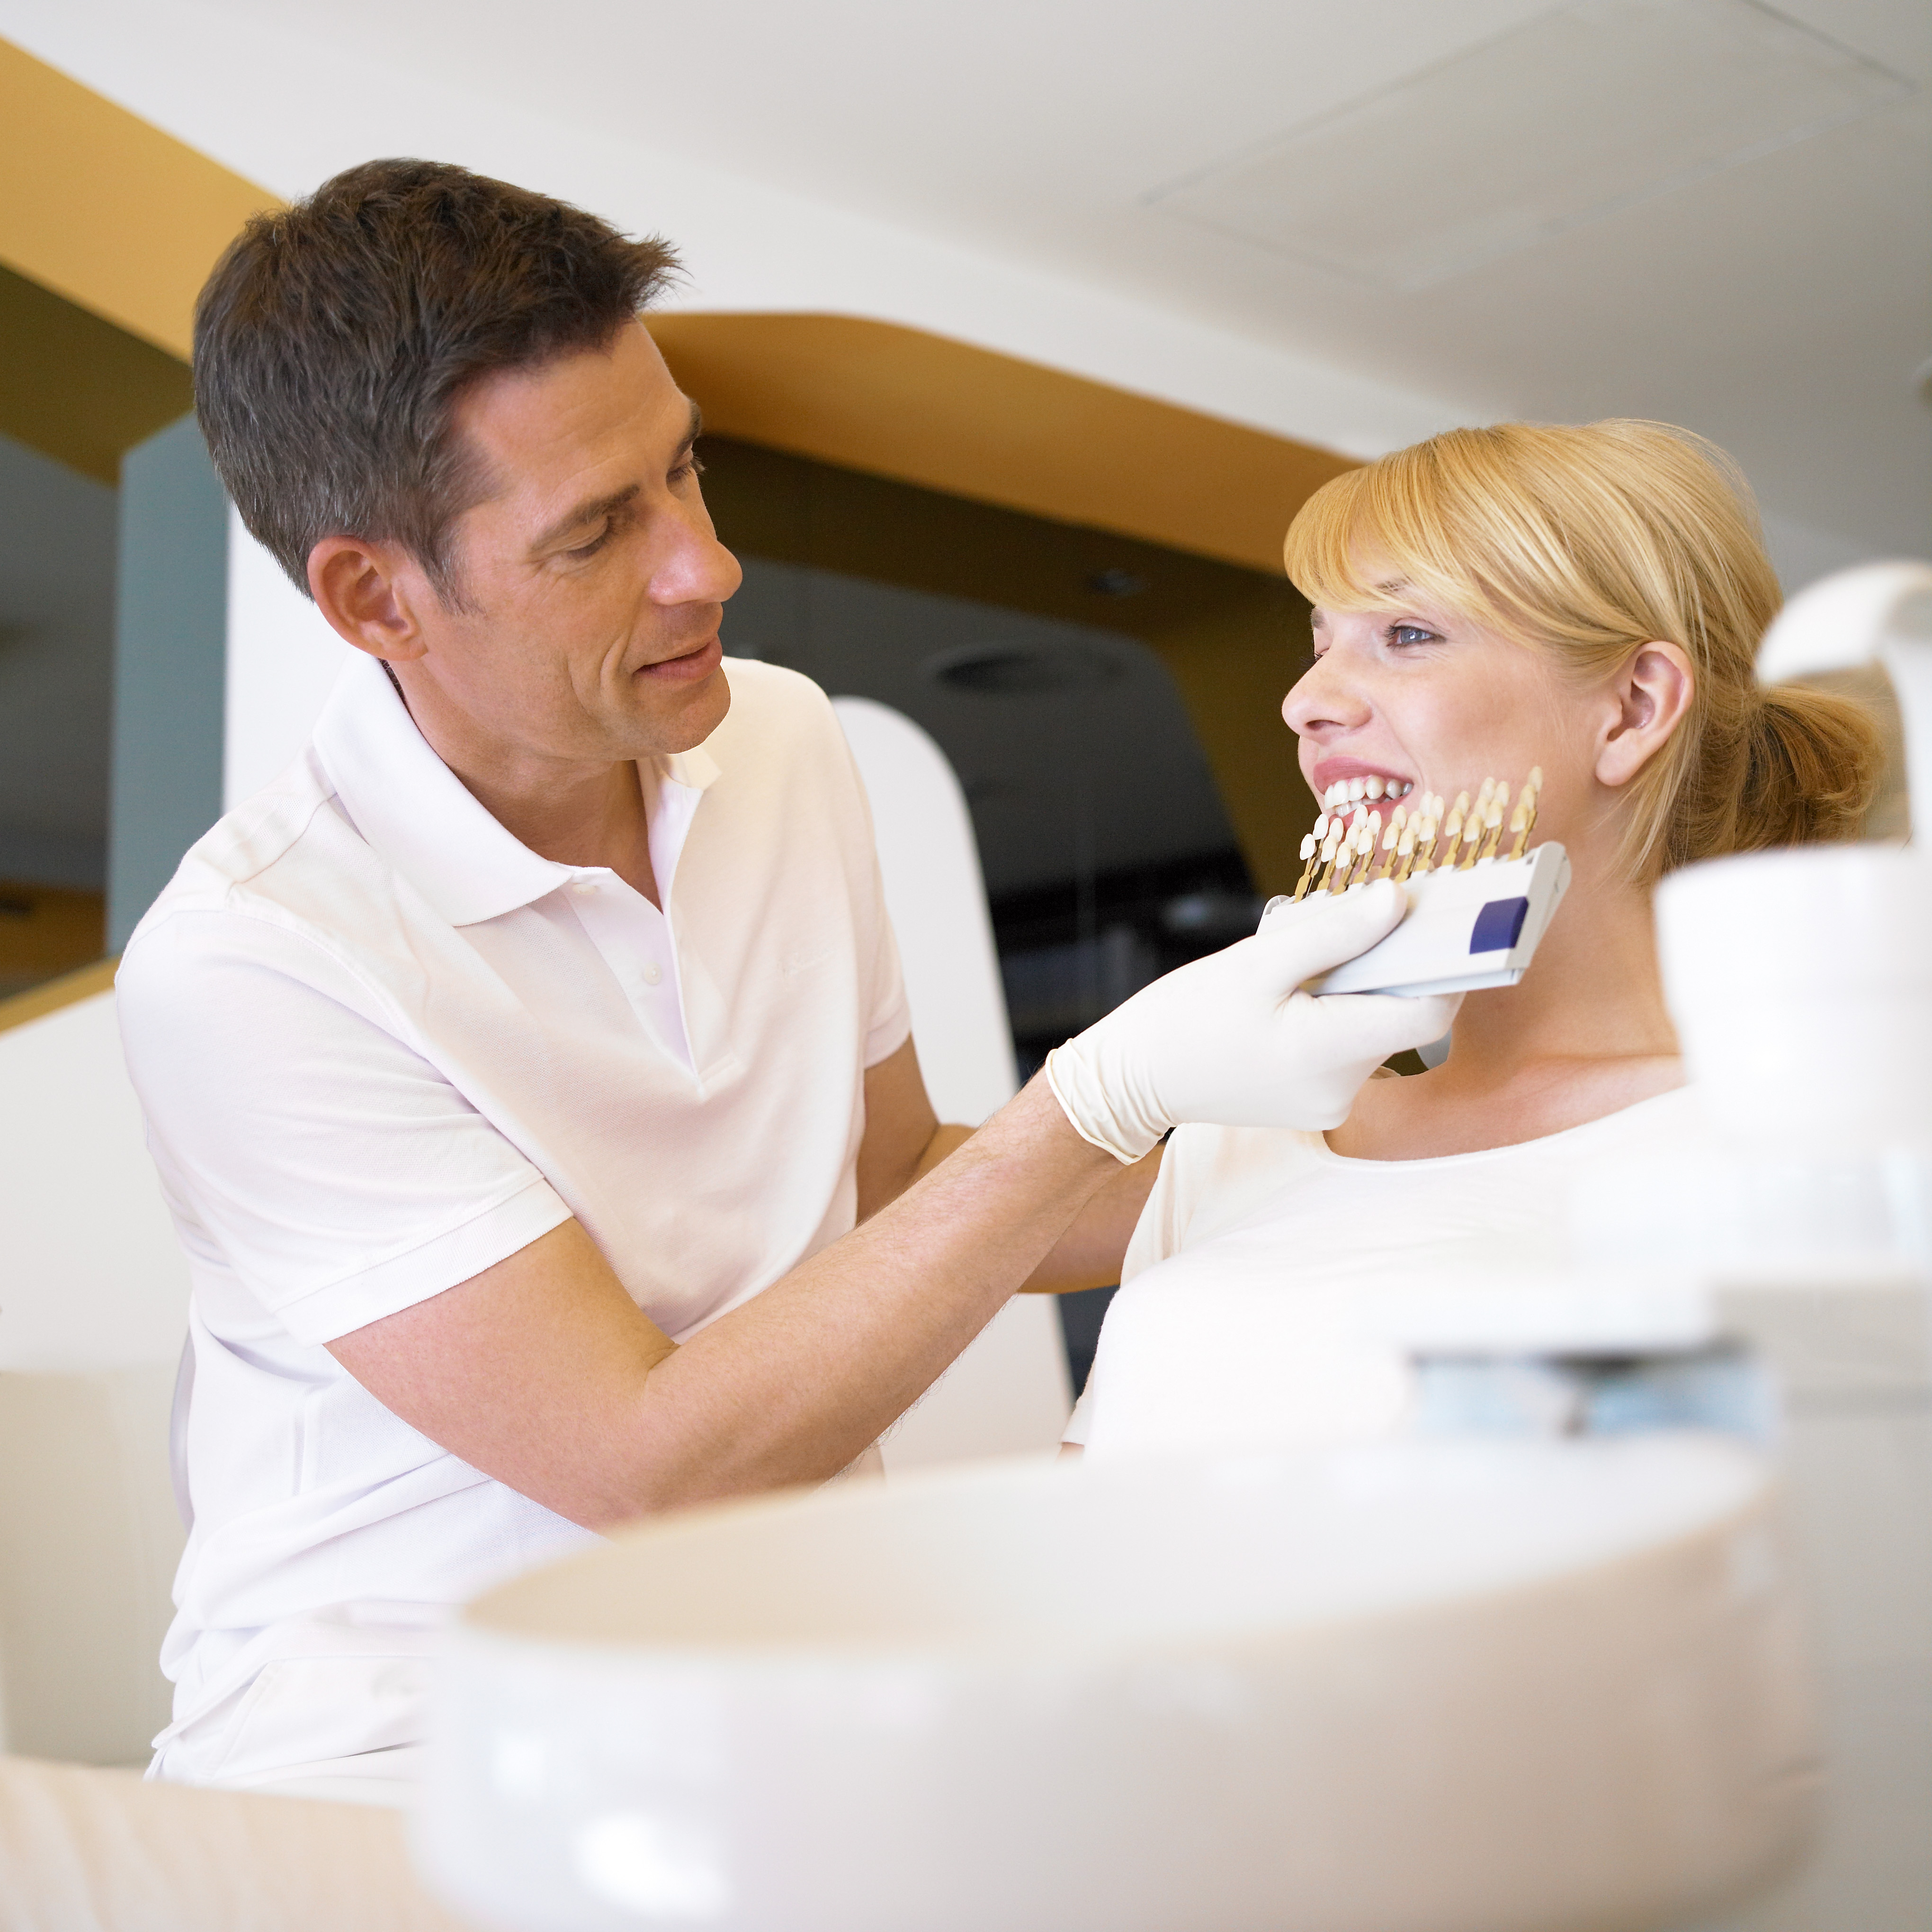 Aesthetics - Cosmetic Dentistry Berlin